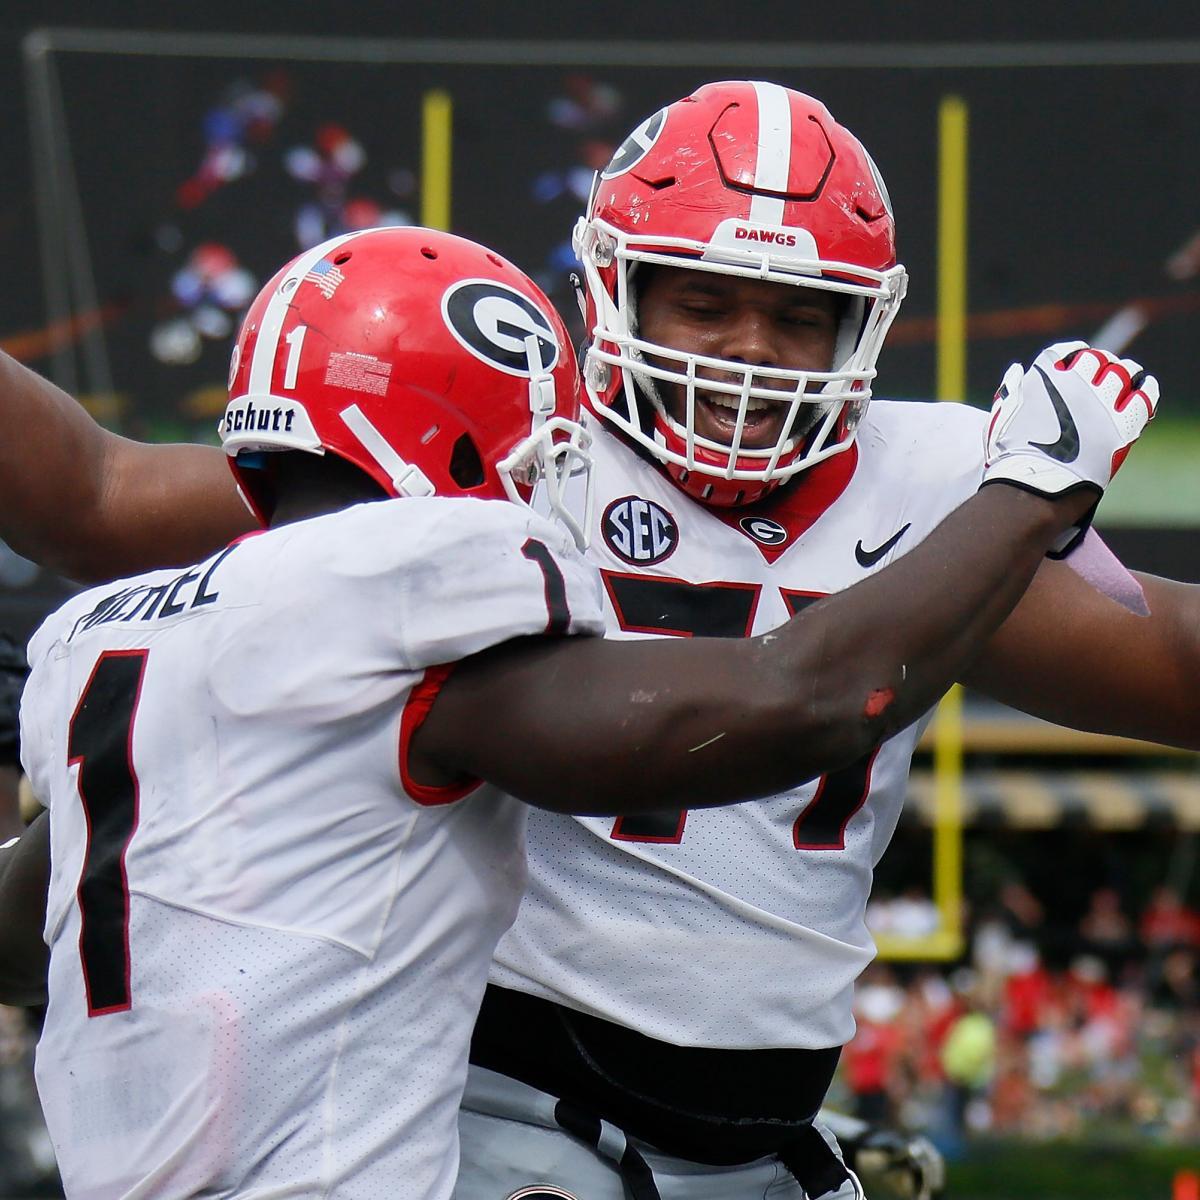 Missouri Tigers vs. Georgia Bulldogs Odds, College Football Betting Pick